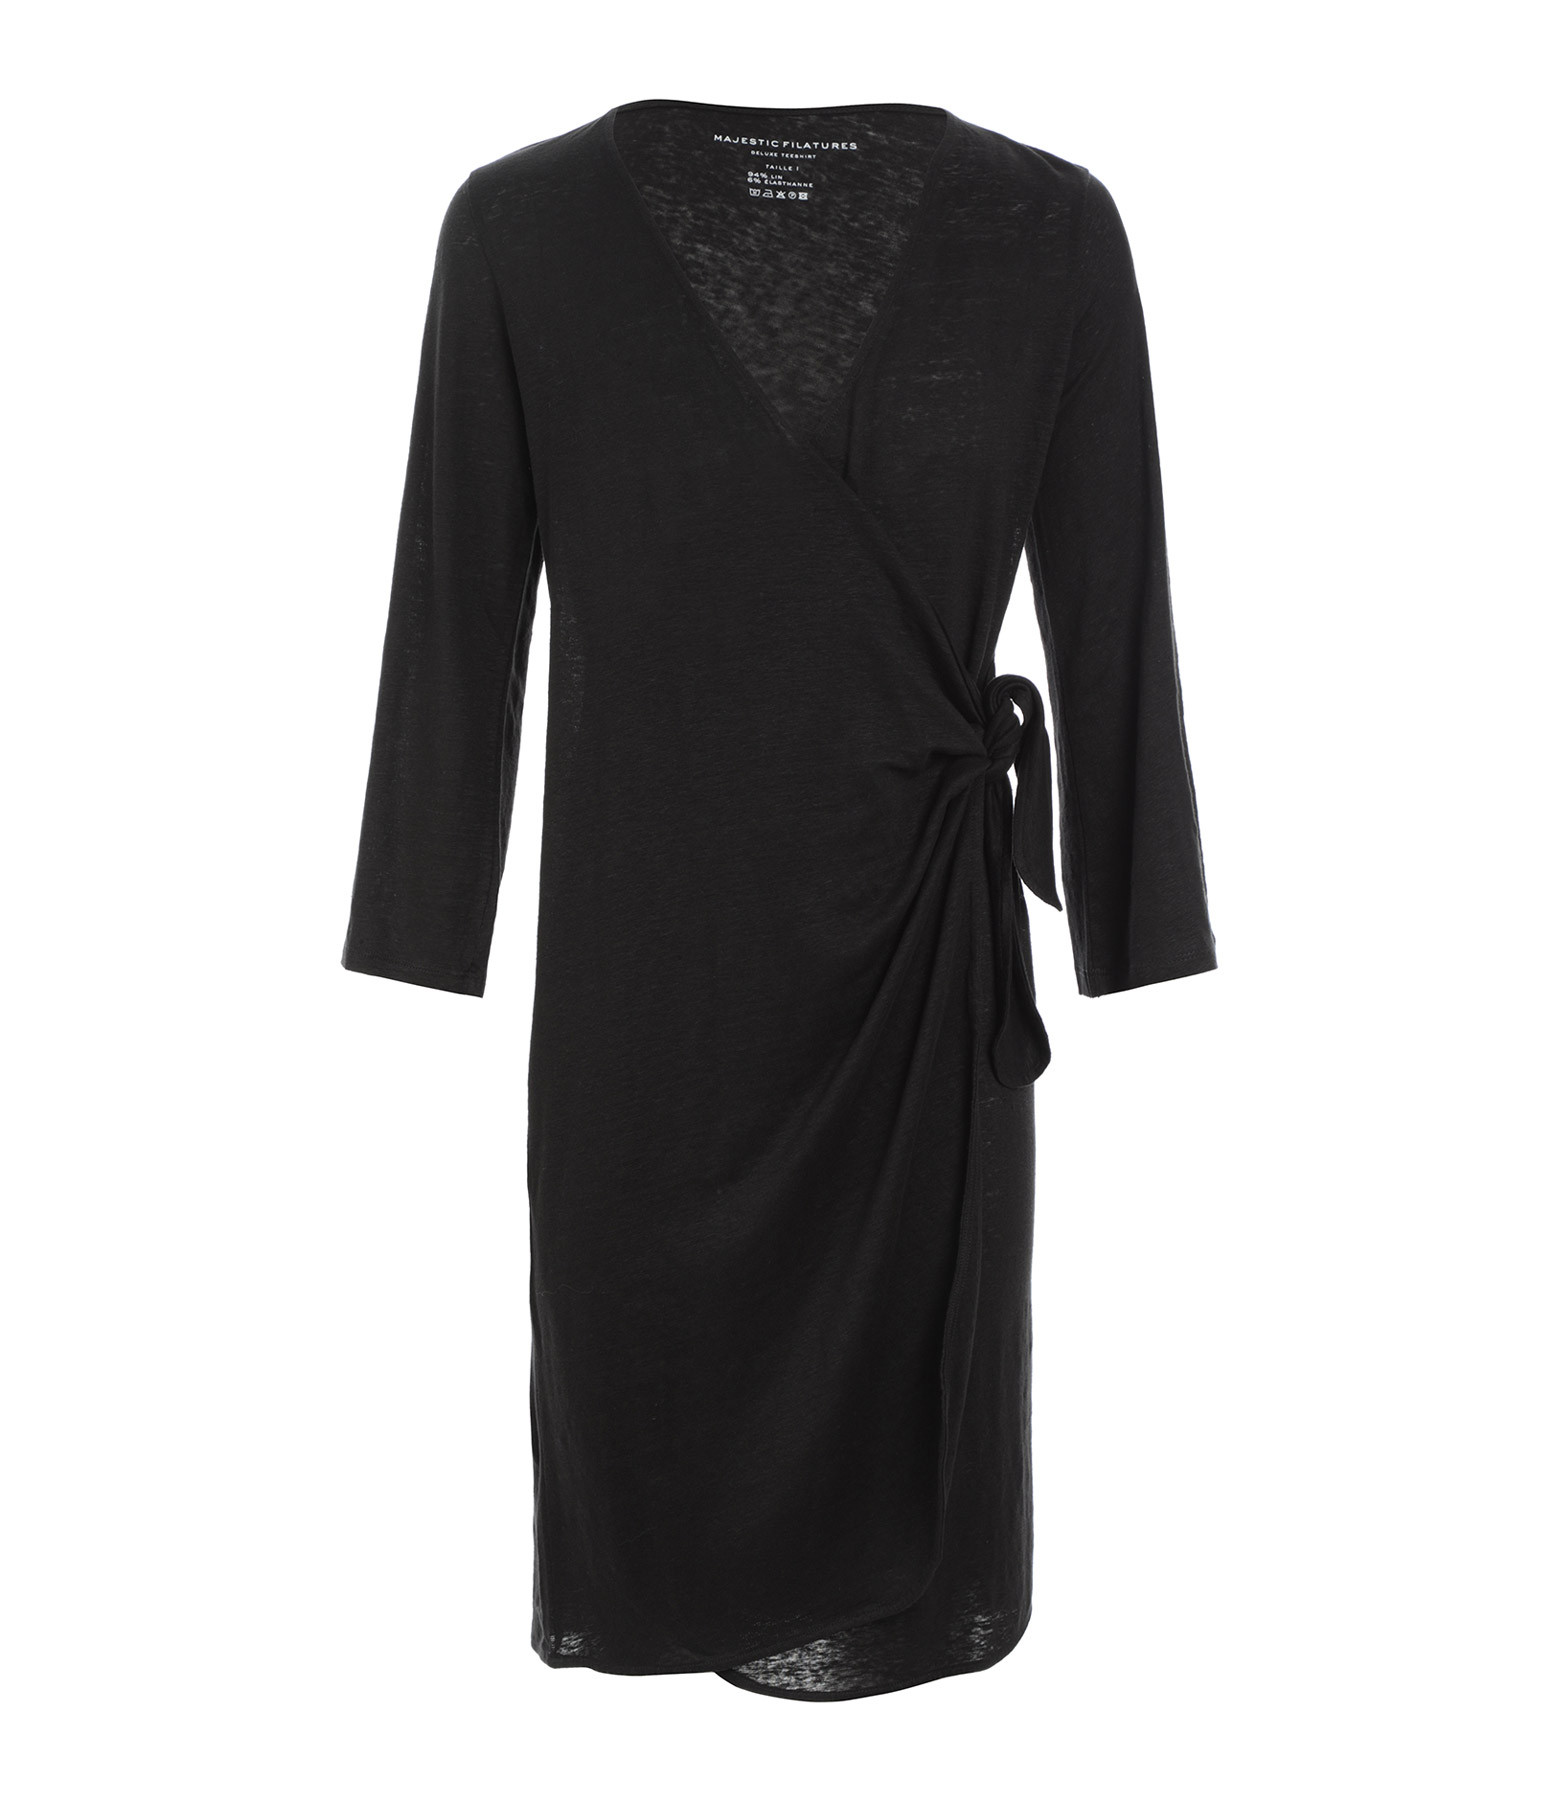 MAJESTIC FILATURES - Robe Portefeuille Lin Noir